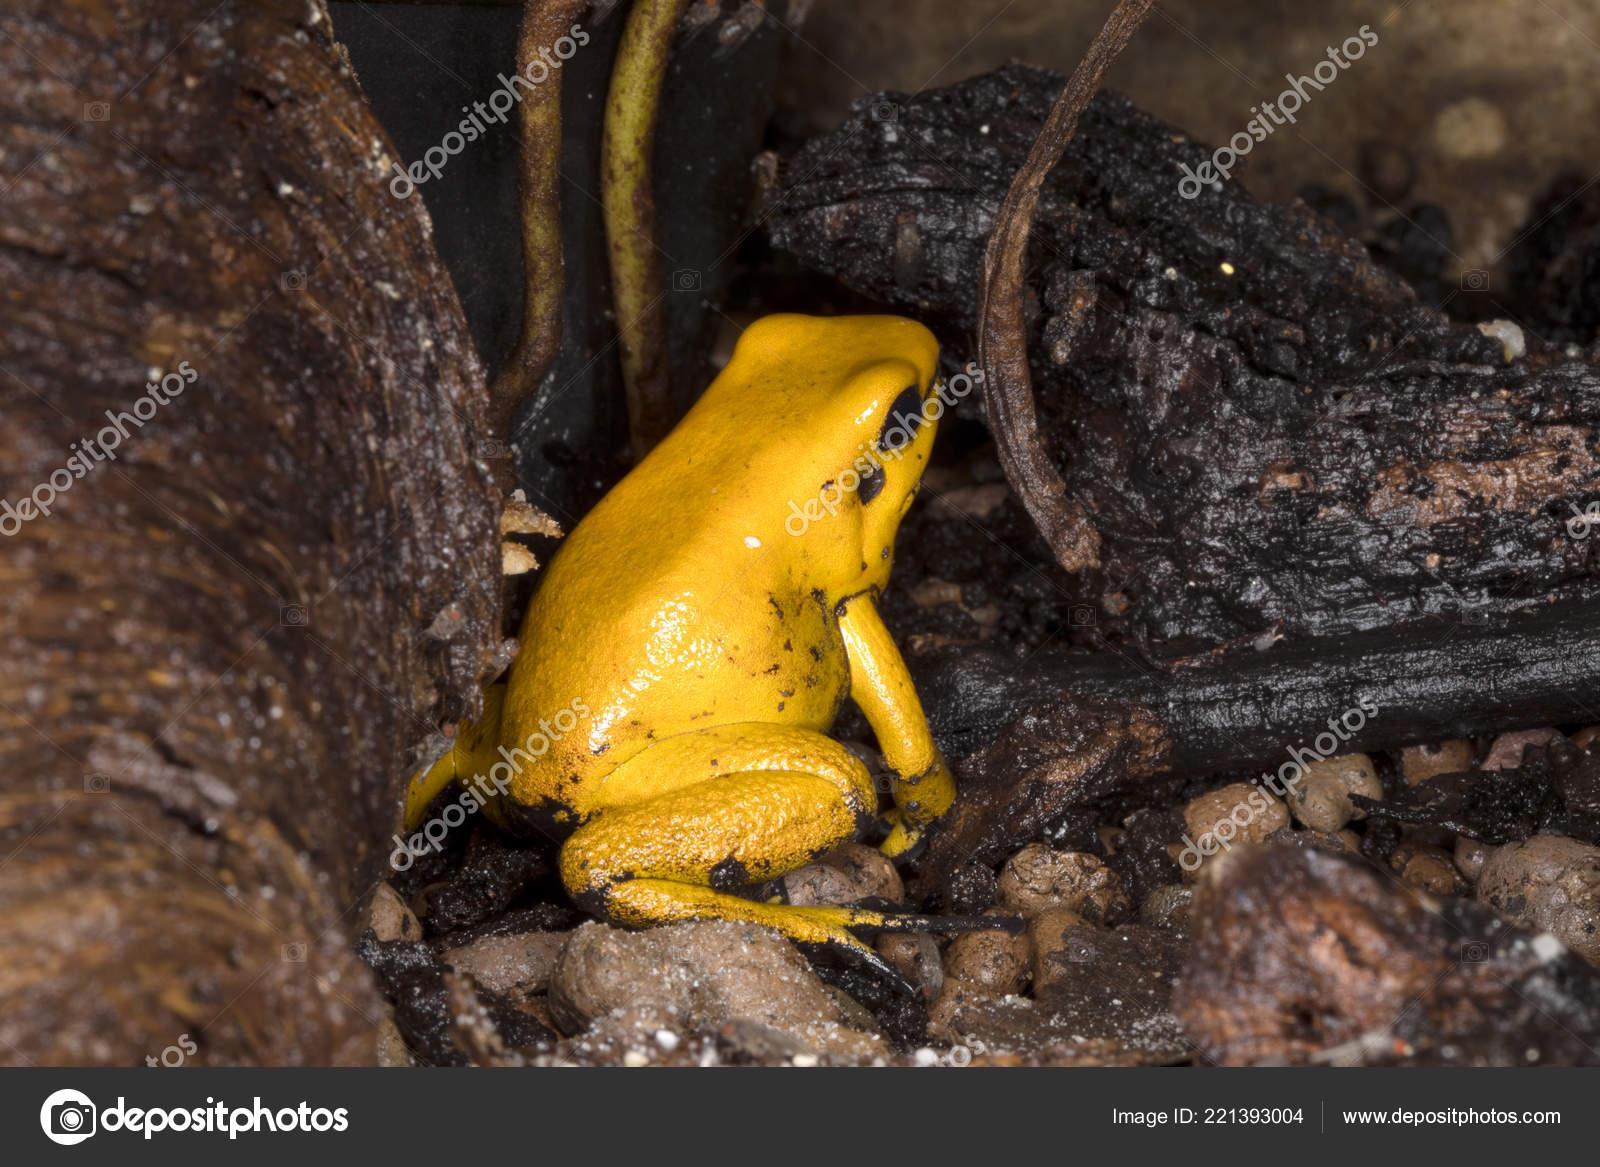 golden poison frog phyllobates terribilis probably most poisonous